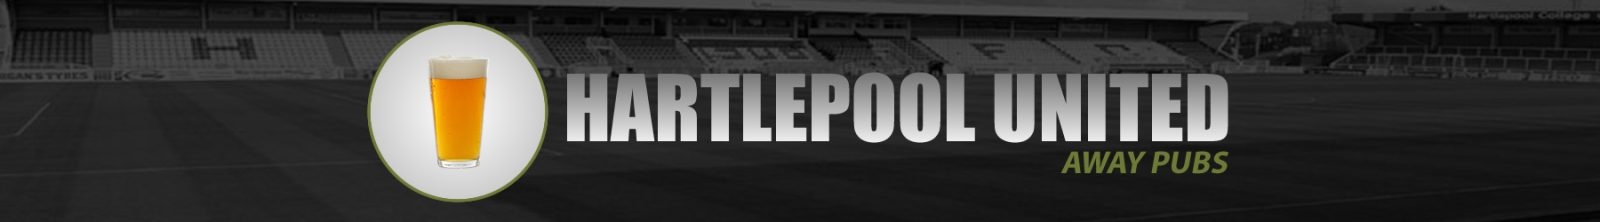 Hartlepool United Away Pubs